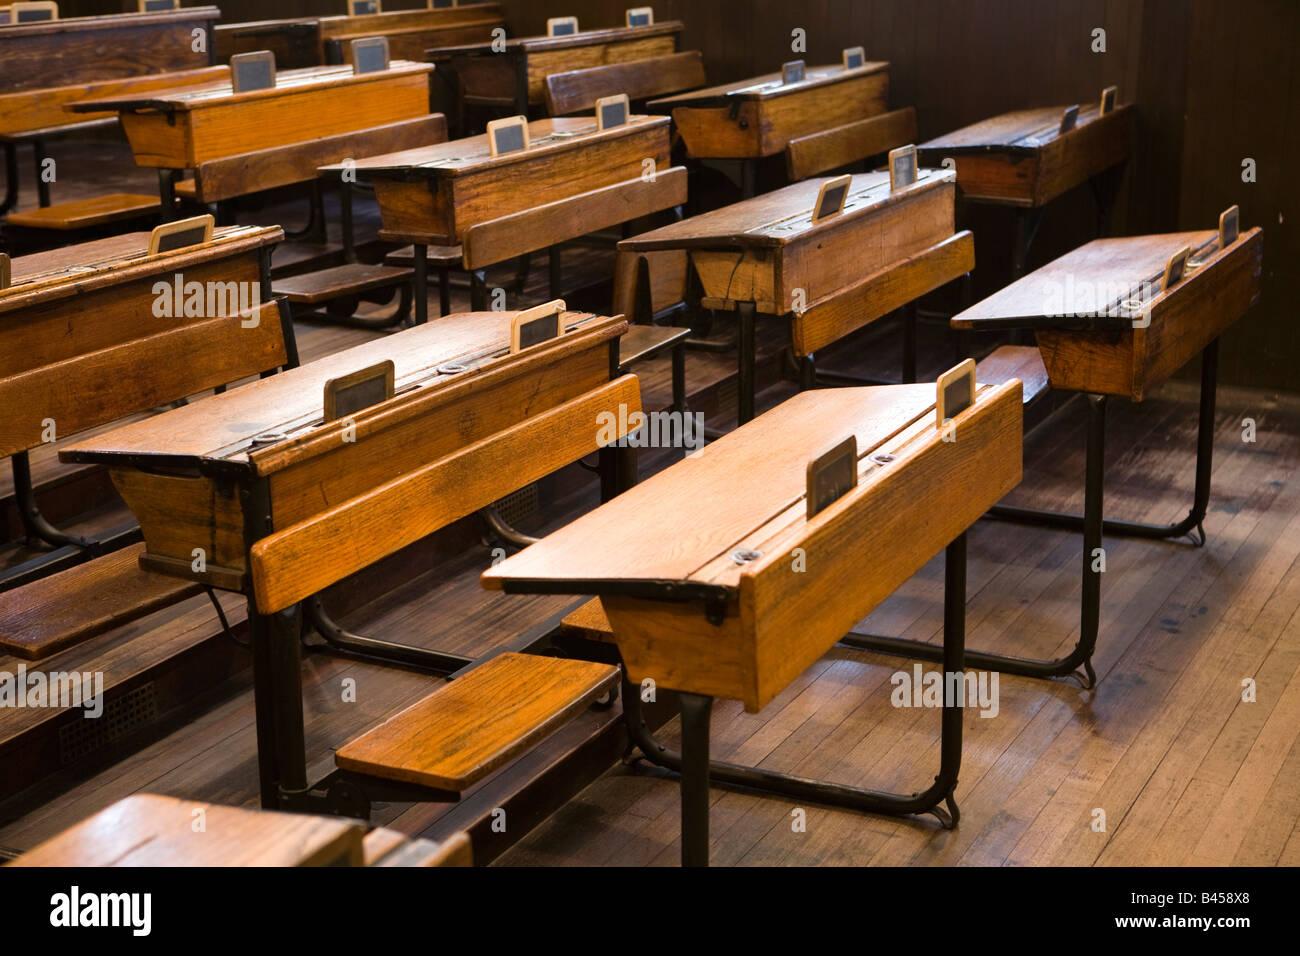 UK Scotland Glasgow Scotland Road School Pre war era schoolroom desks with slates - Stock Image